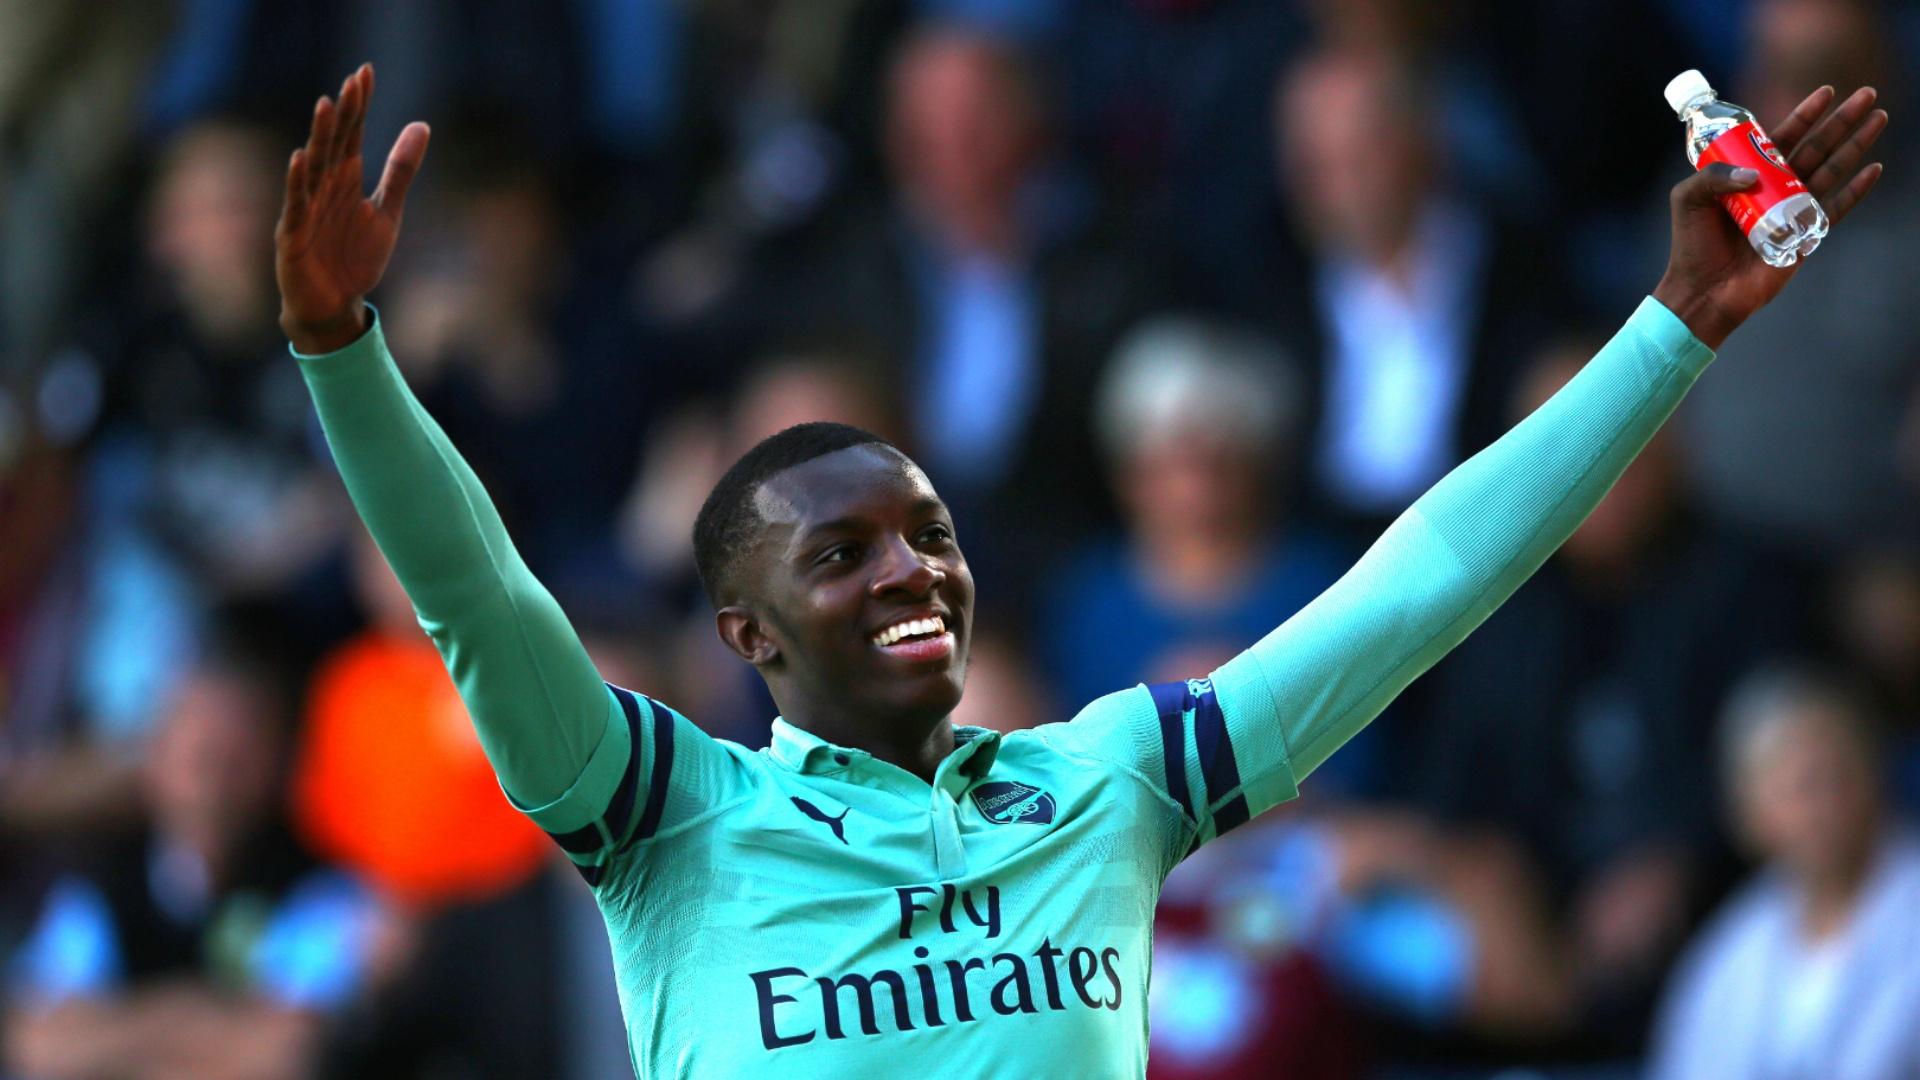 Arsenal boss Arteta impressed with Nketiah's development